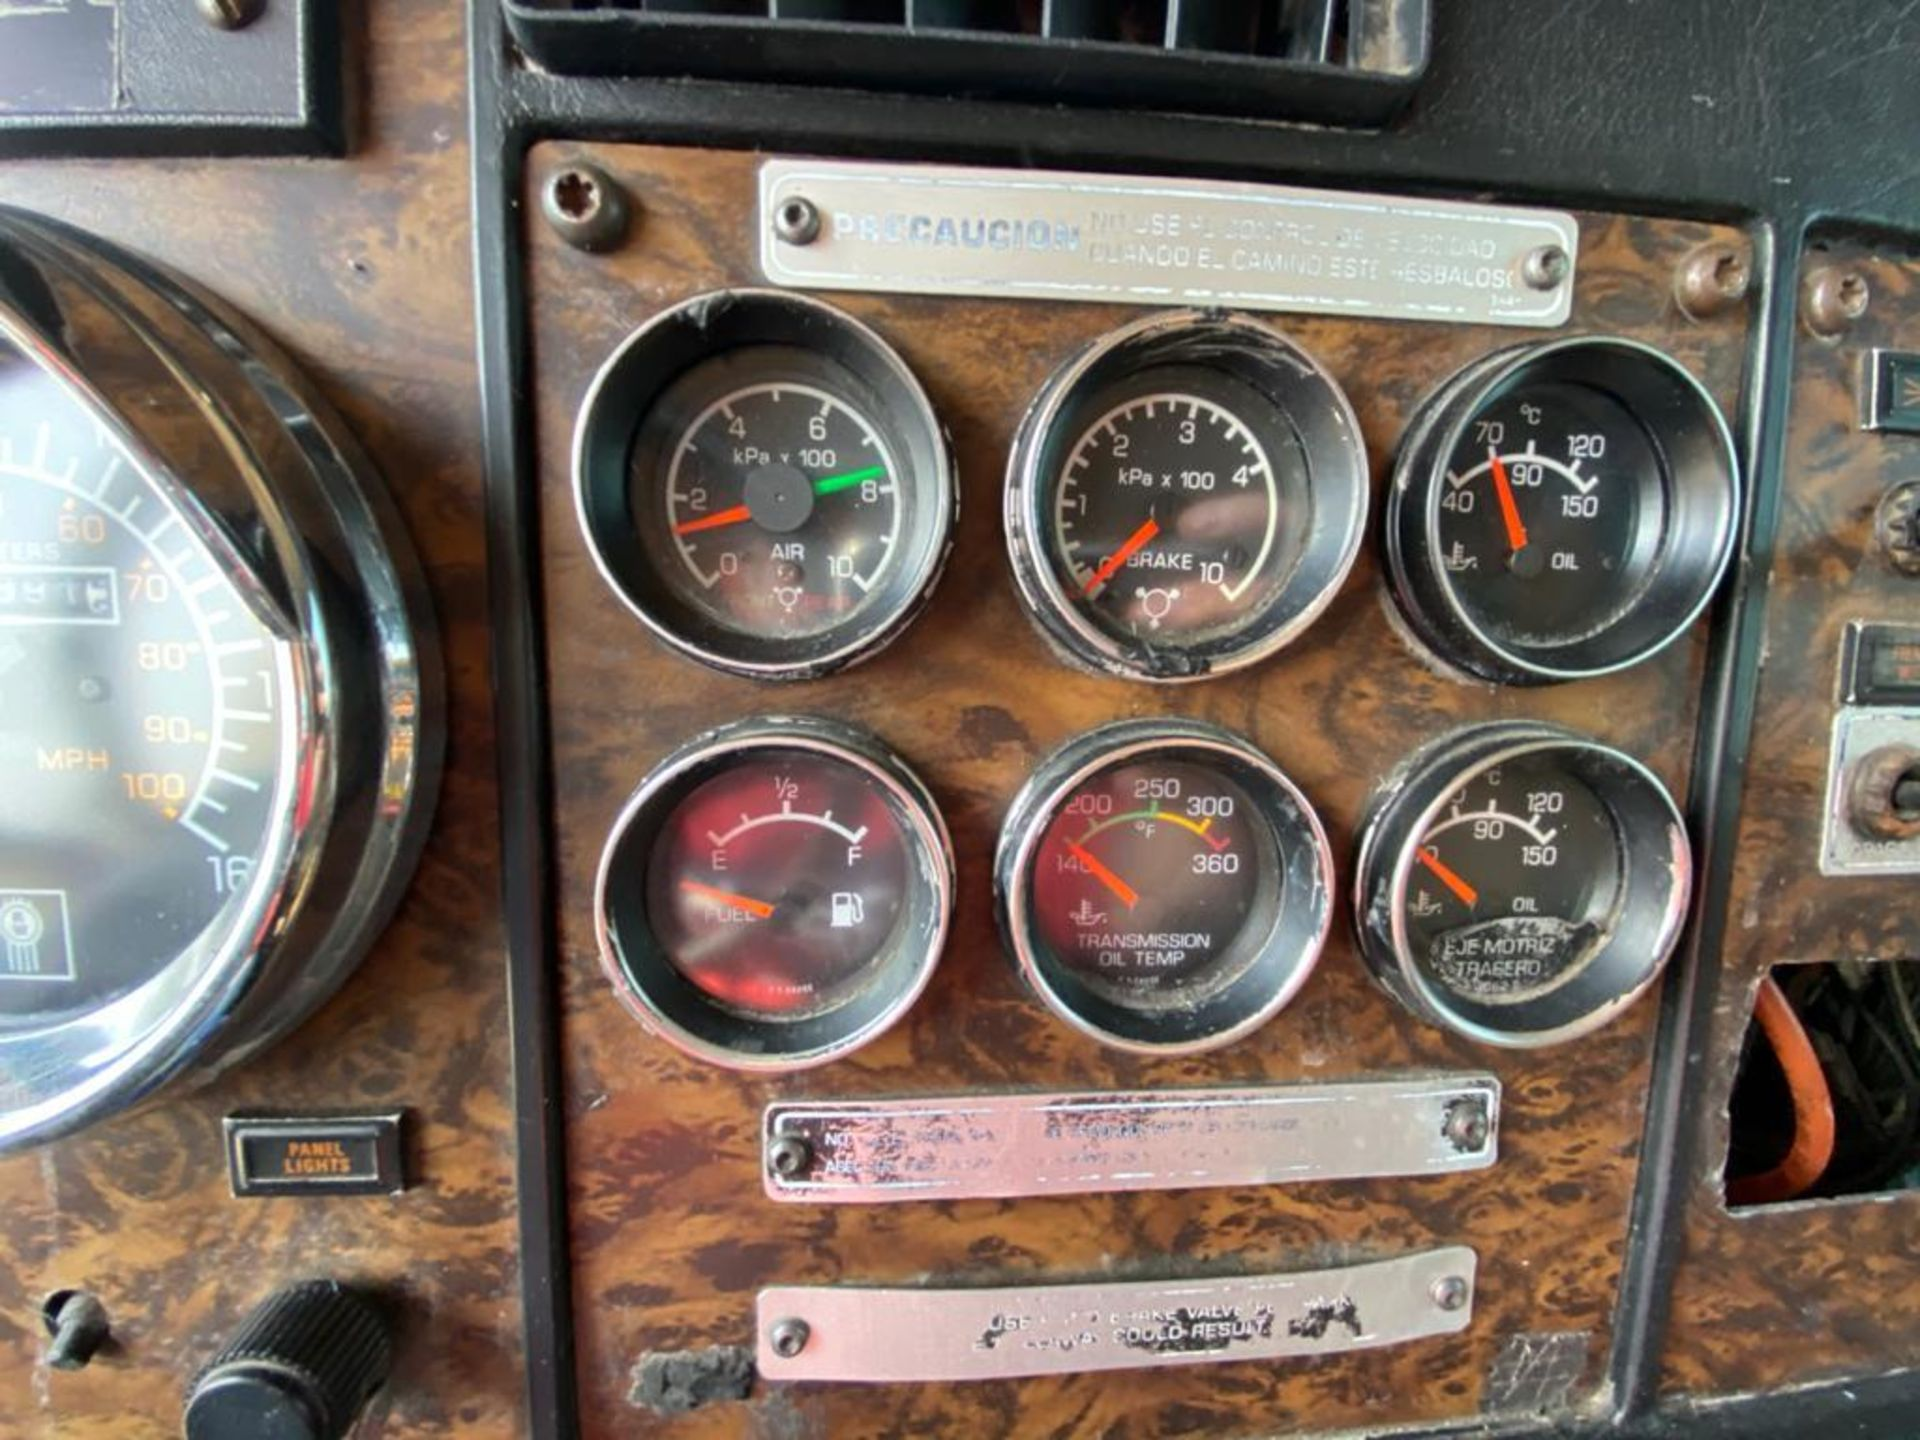 1999 Kenworth Sleeper truck tractor, standard transmission of 18 speeds - Image 42 of 75